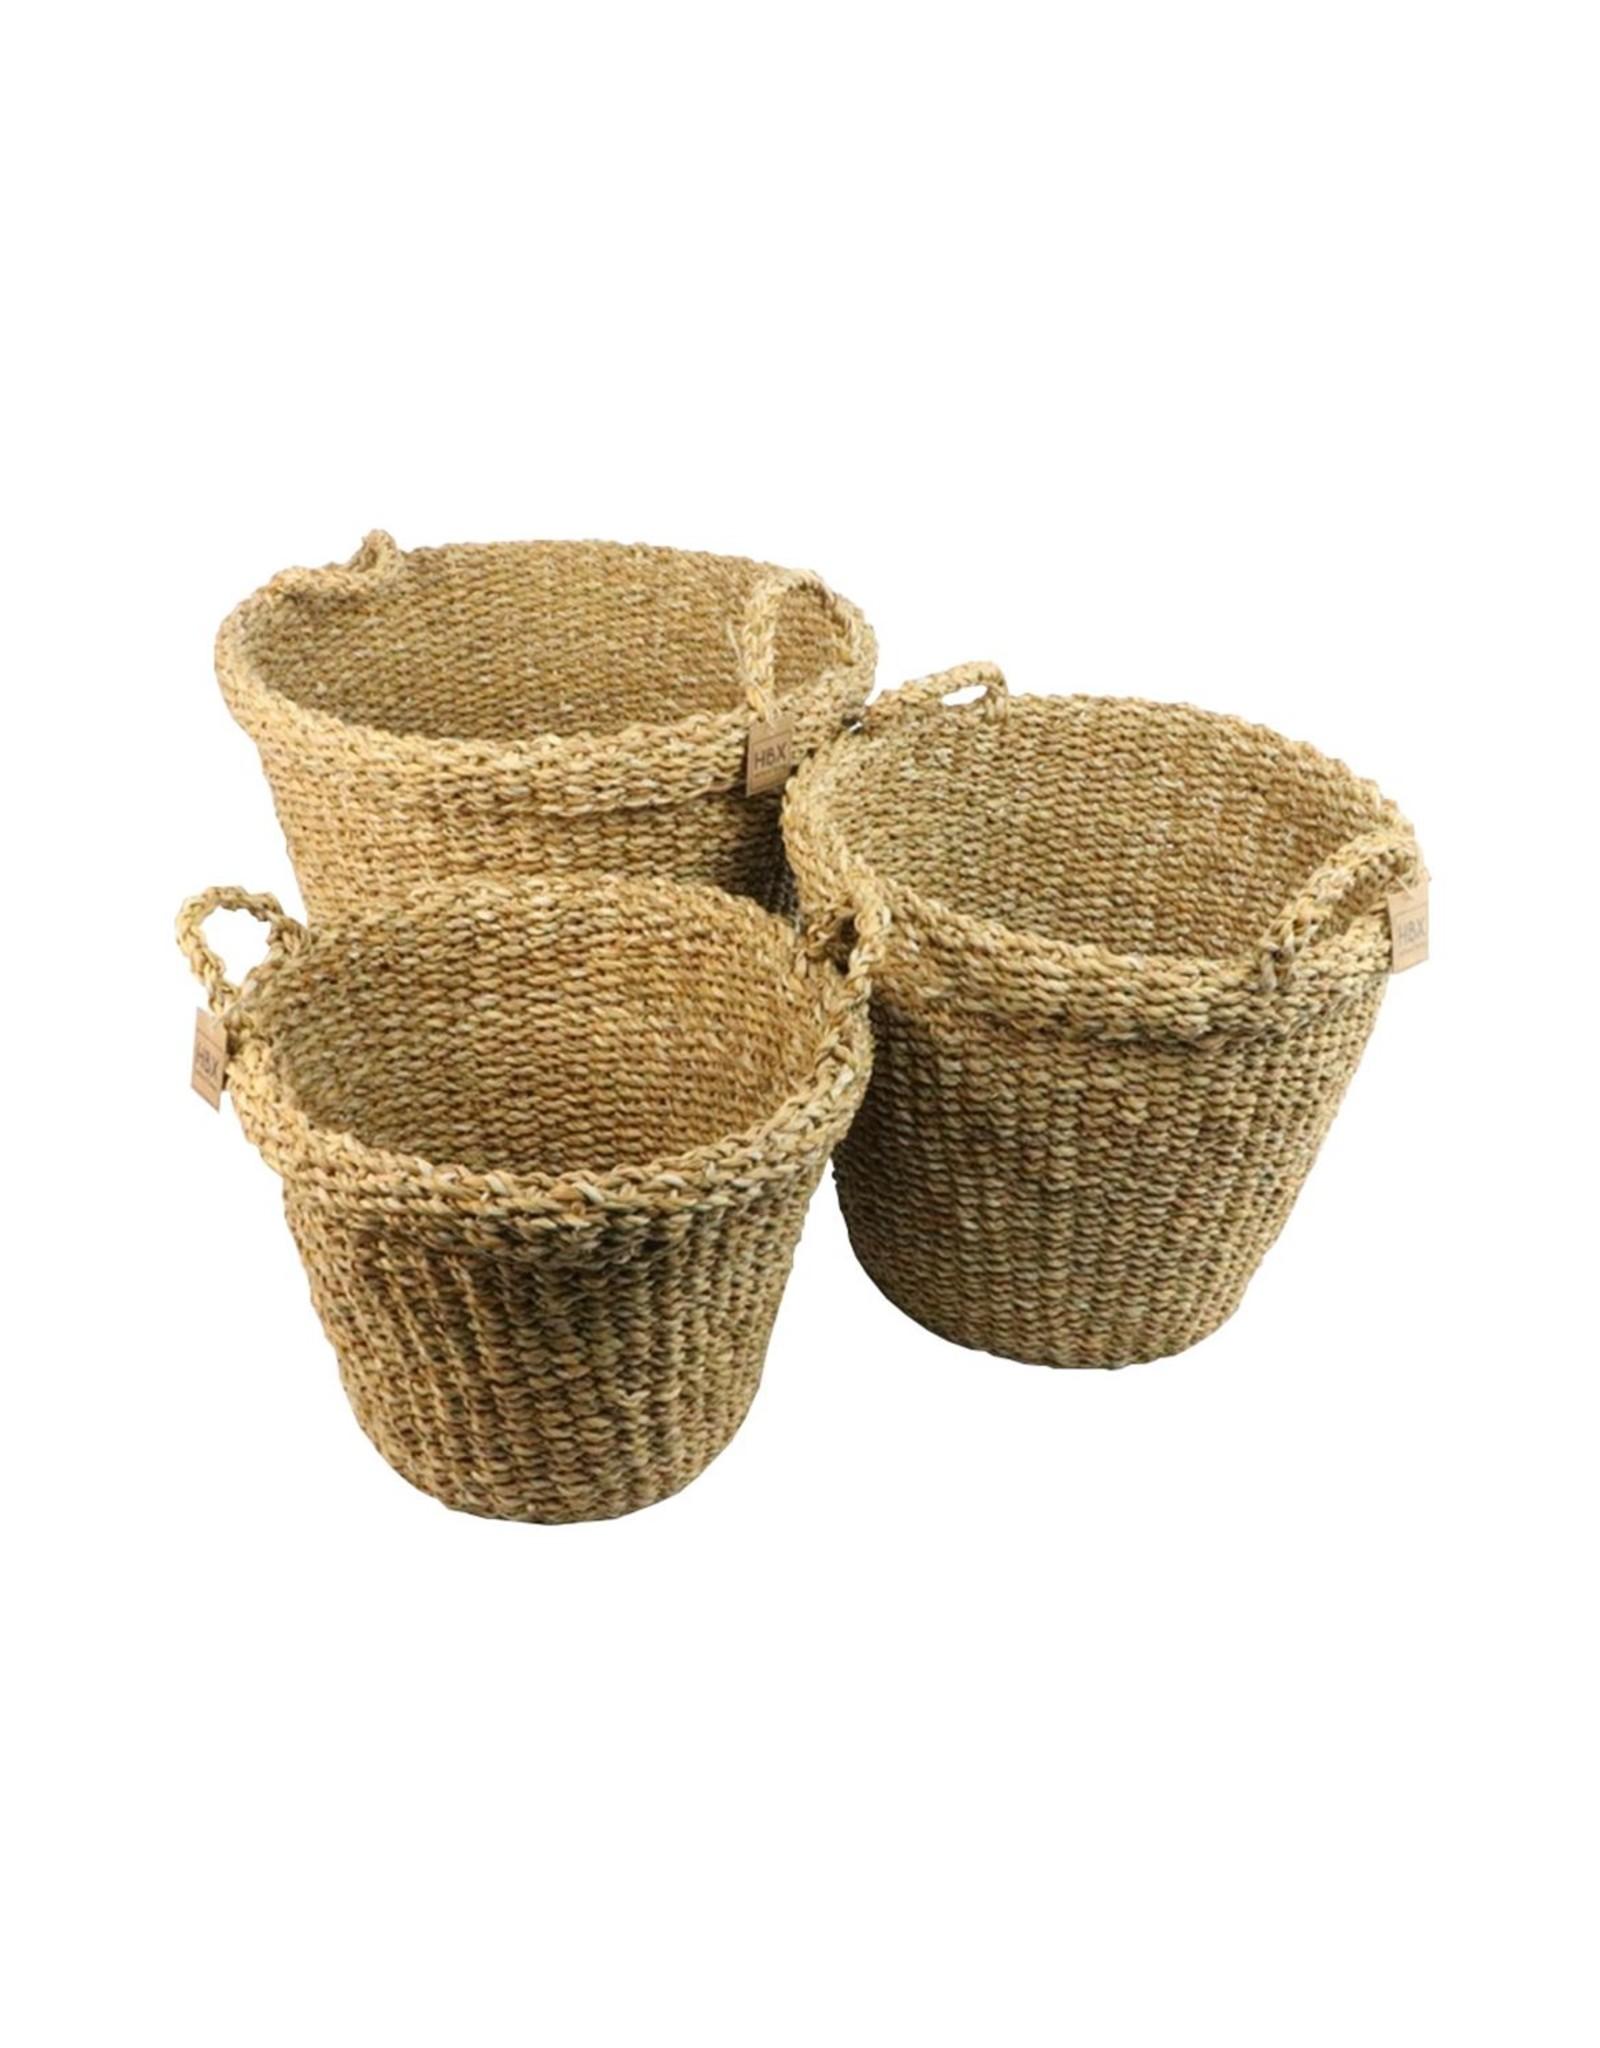 HD Bask. Manatee Grass S/3 (x 1)